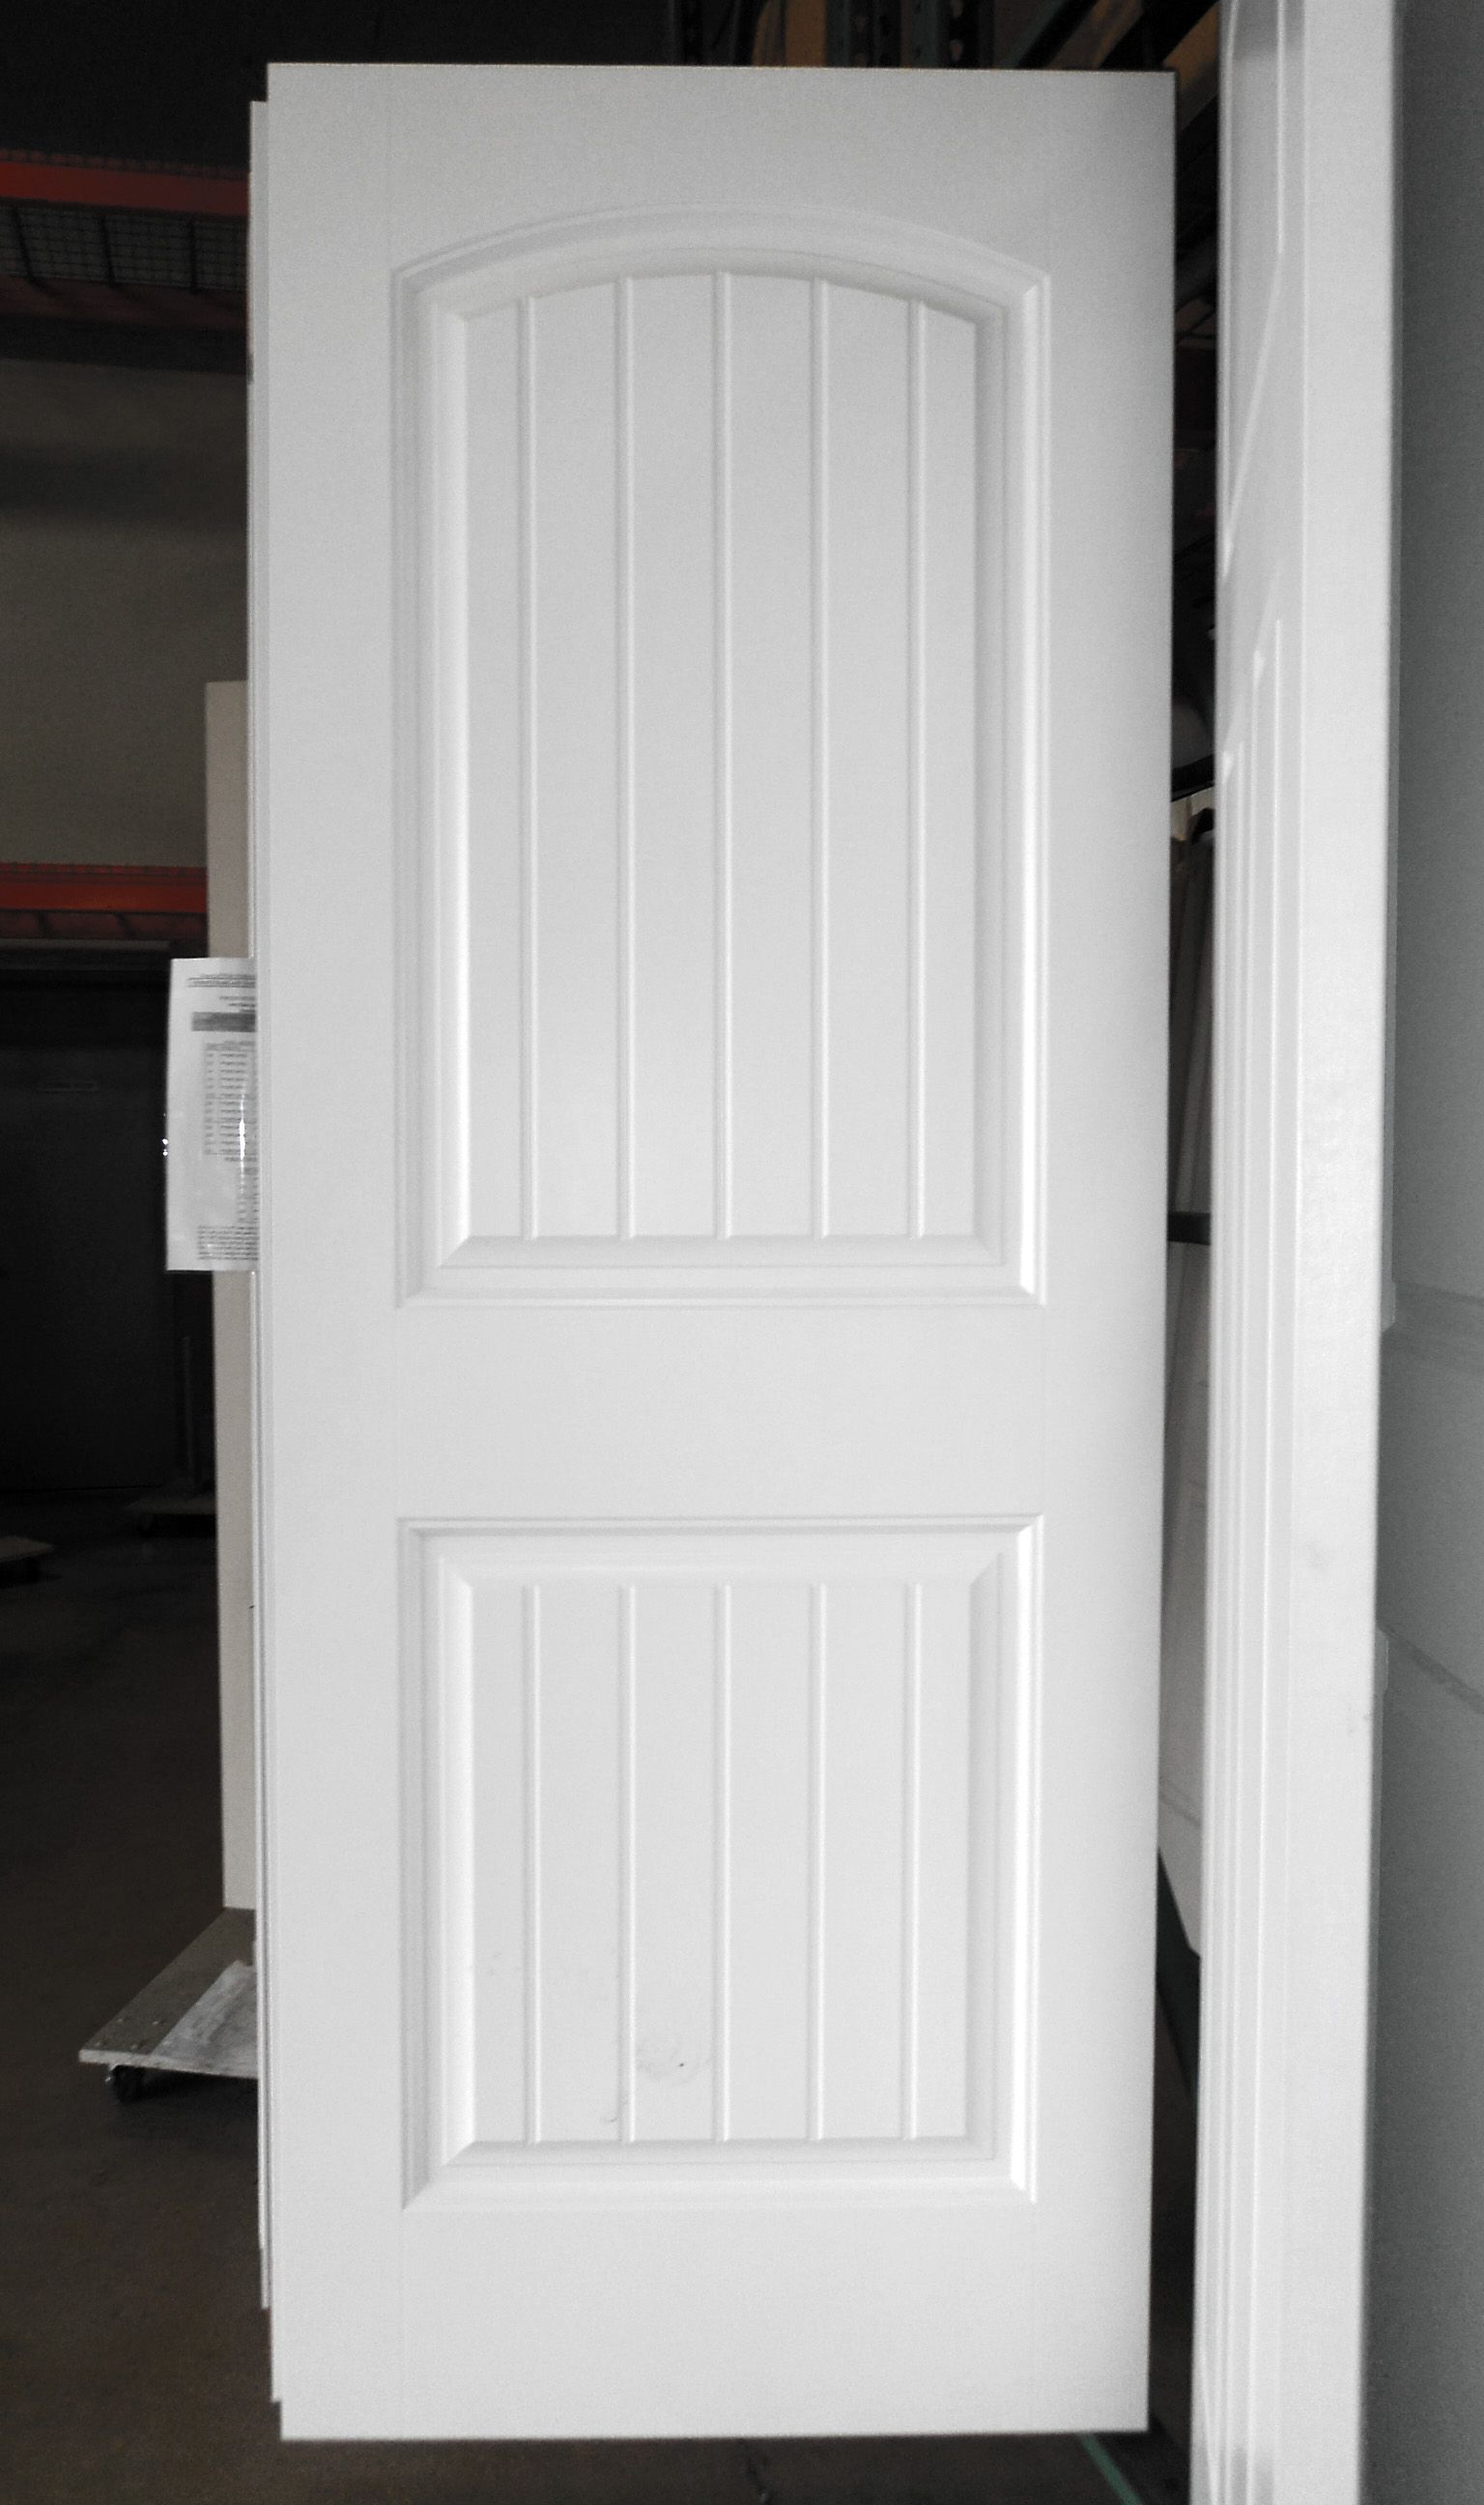 2 Panel Painted White Cheyenne Smooth Masonite Hollow Core